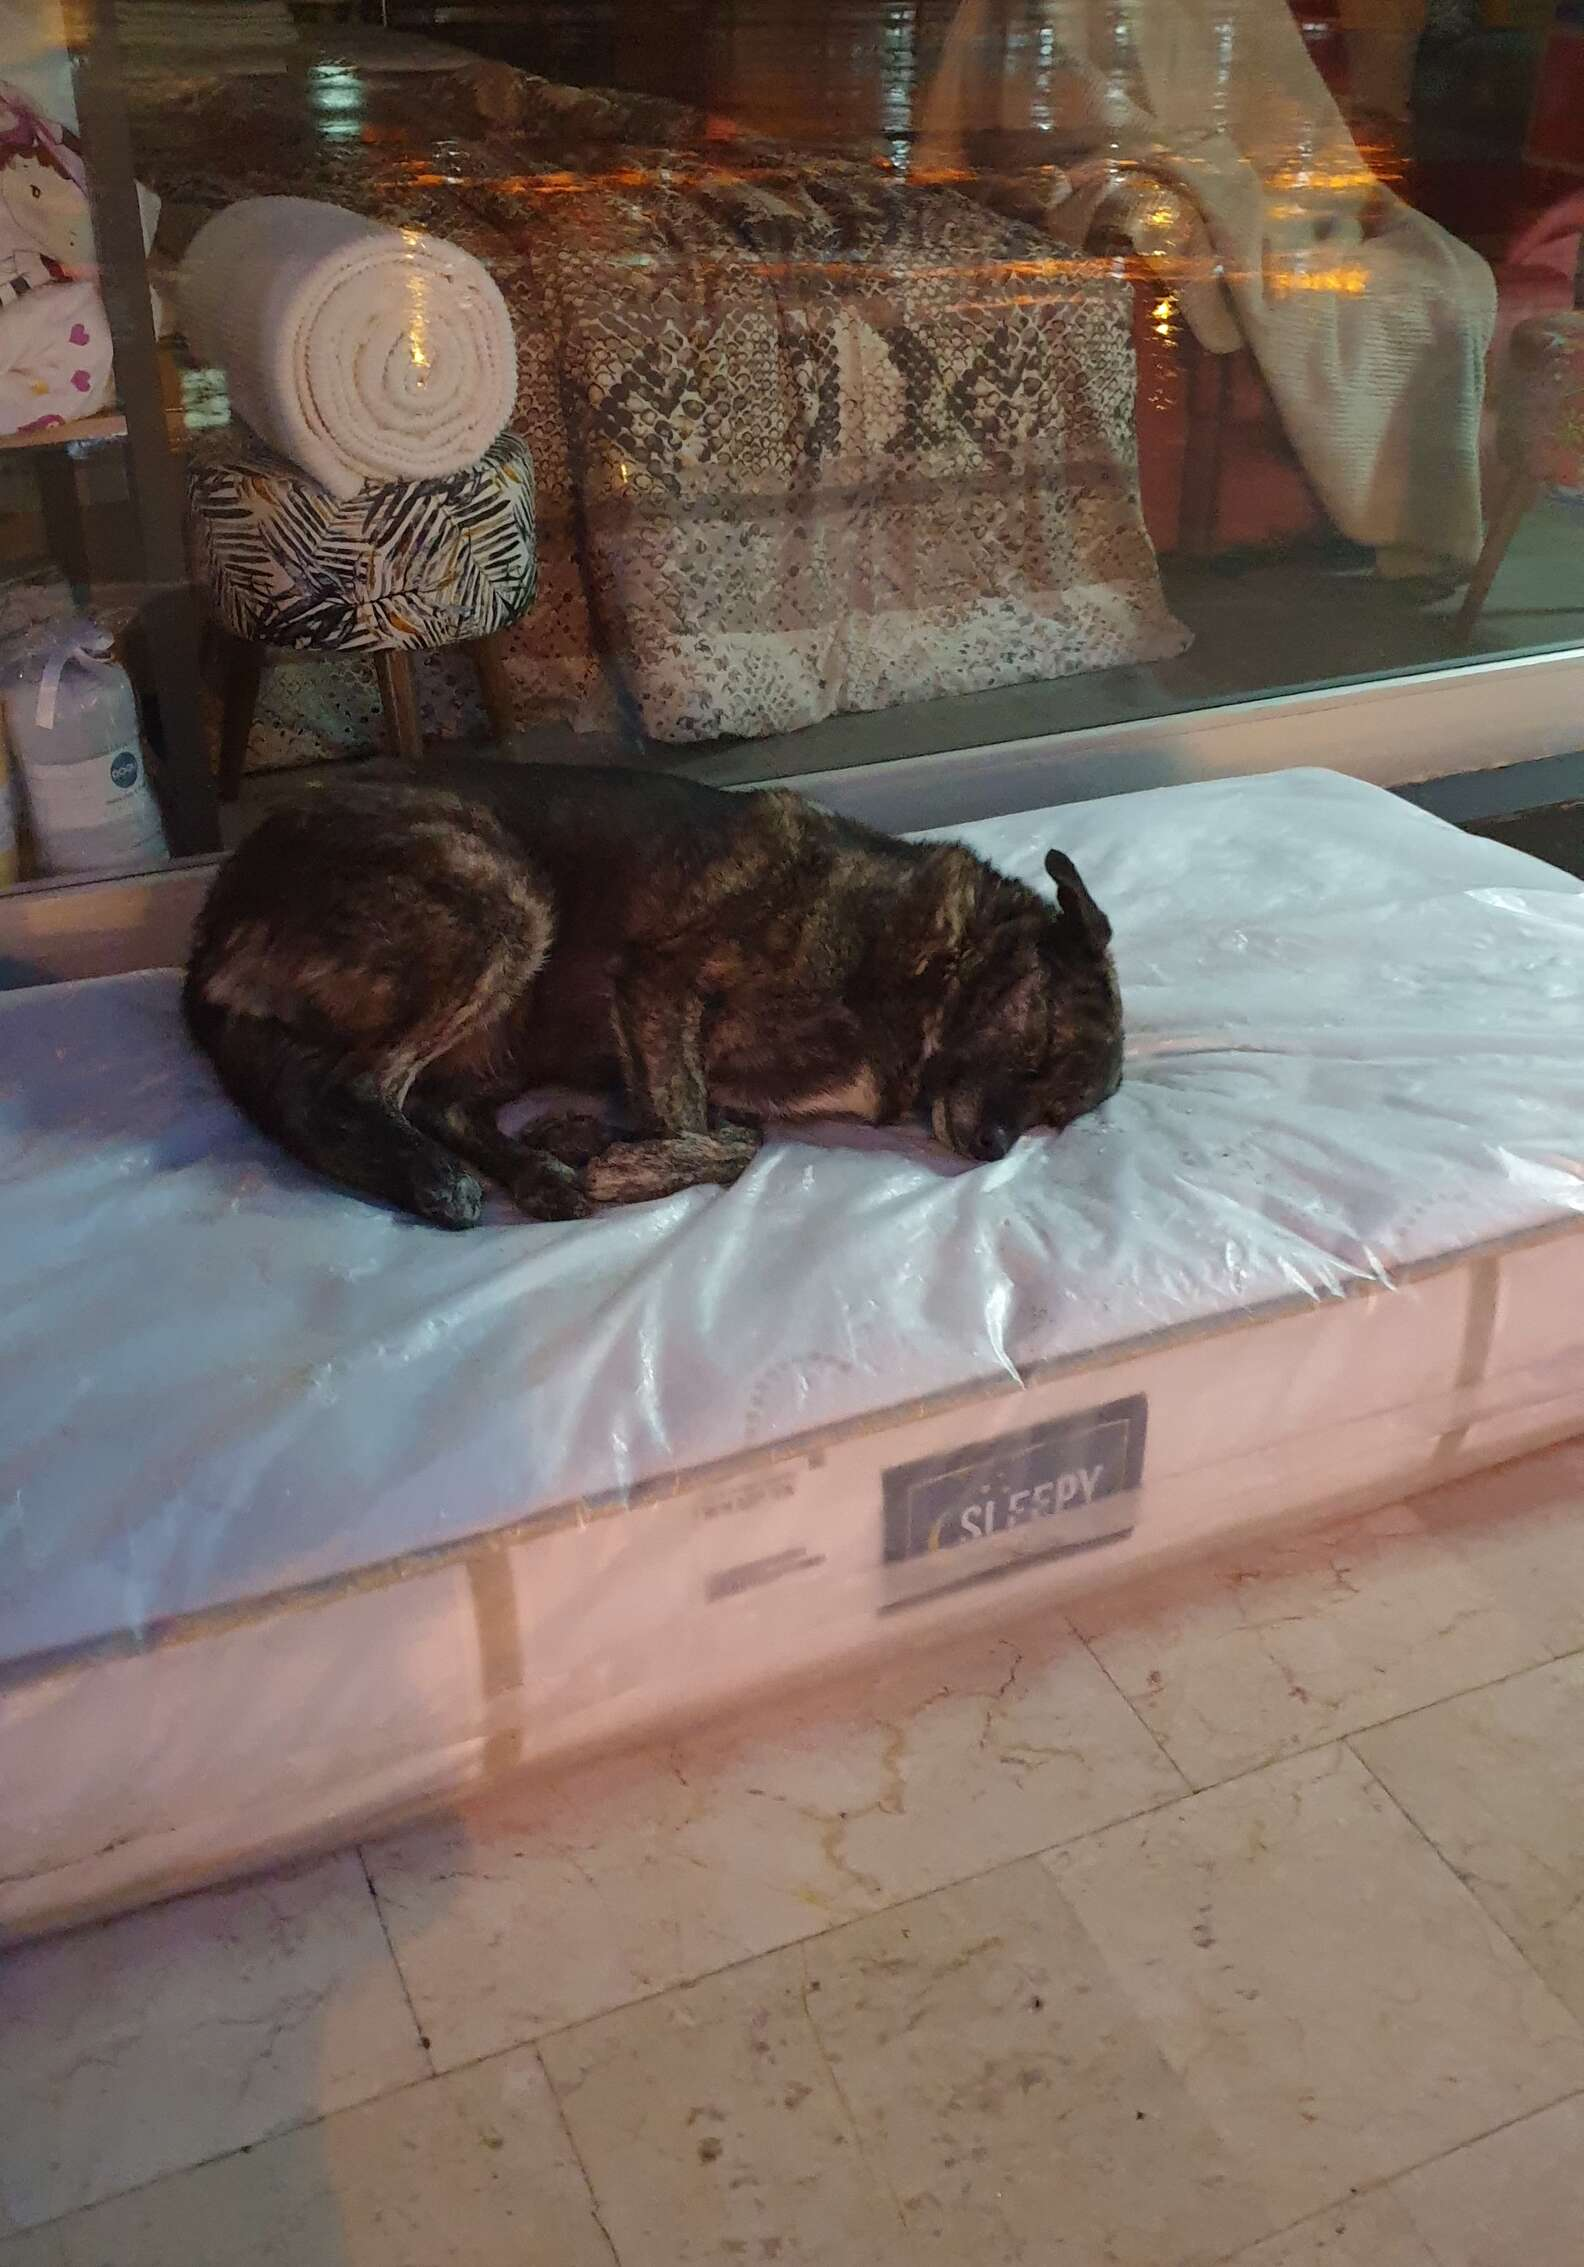 Cucciolo riposa serenamente